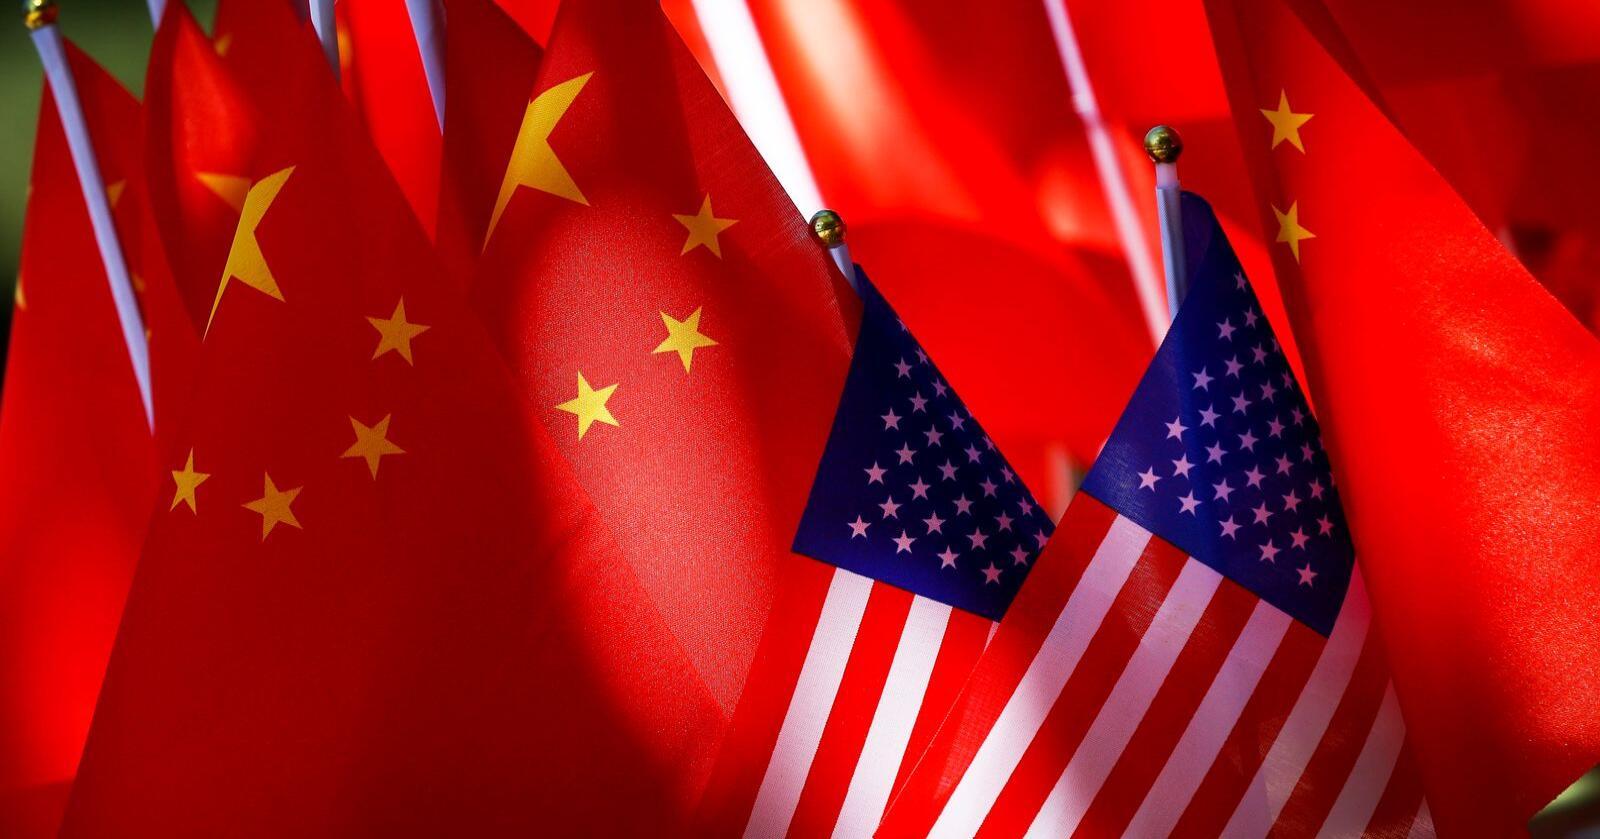 Amerikanske og kinesiske flagg fotografert sammen i Beijing i september 2018. Arkivfoto: Andy Wong / AP / NTB scanpix